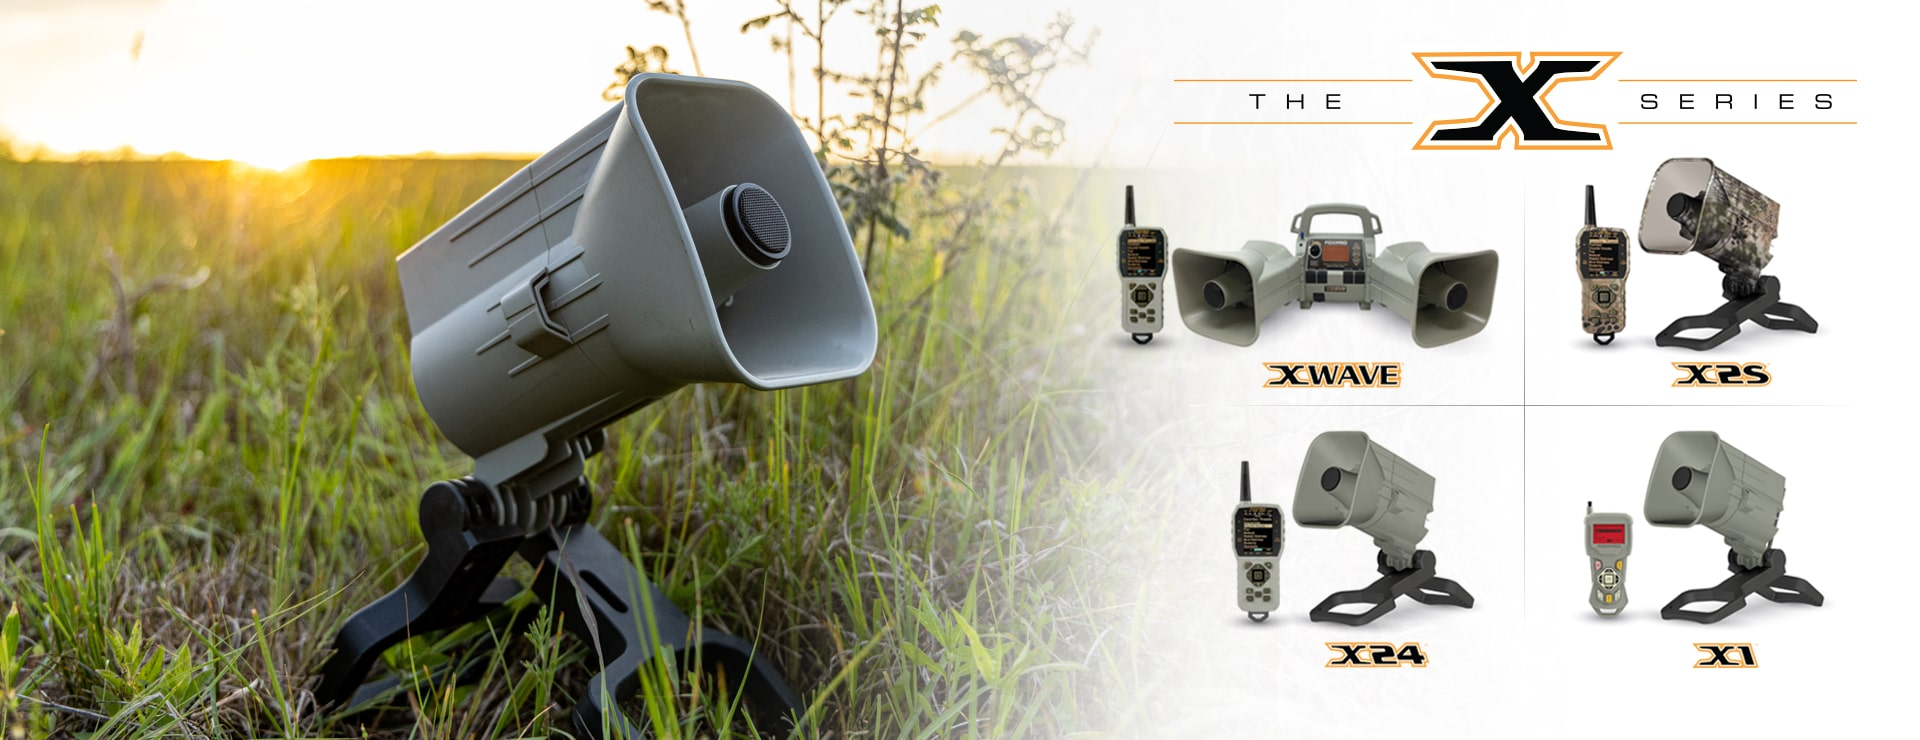 FOXPRO - X Series